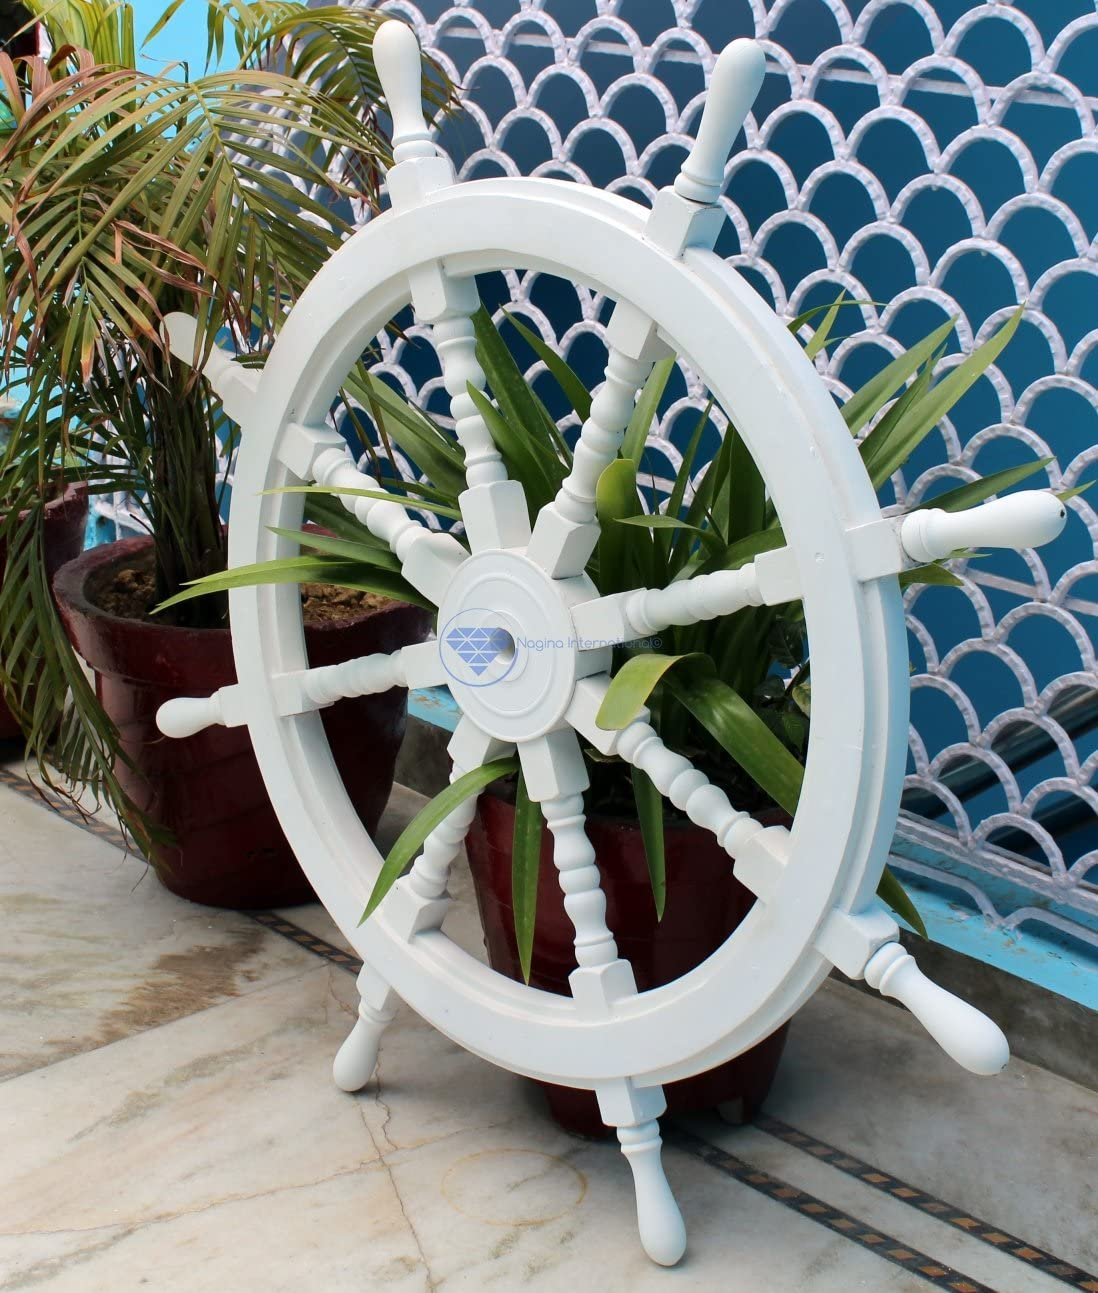 Nagina International White Washed Ship Wheel Wood Ship's Wheels/Wood Ship Steering Wheel/Nautical Home Decor (48 Inches)